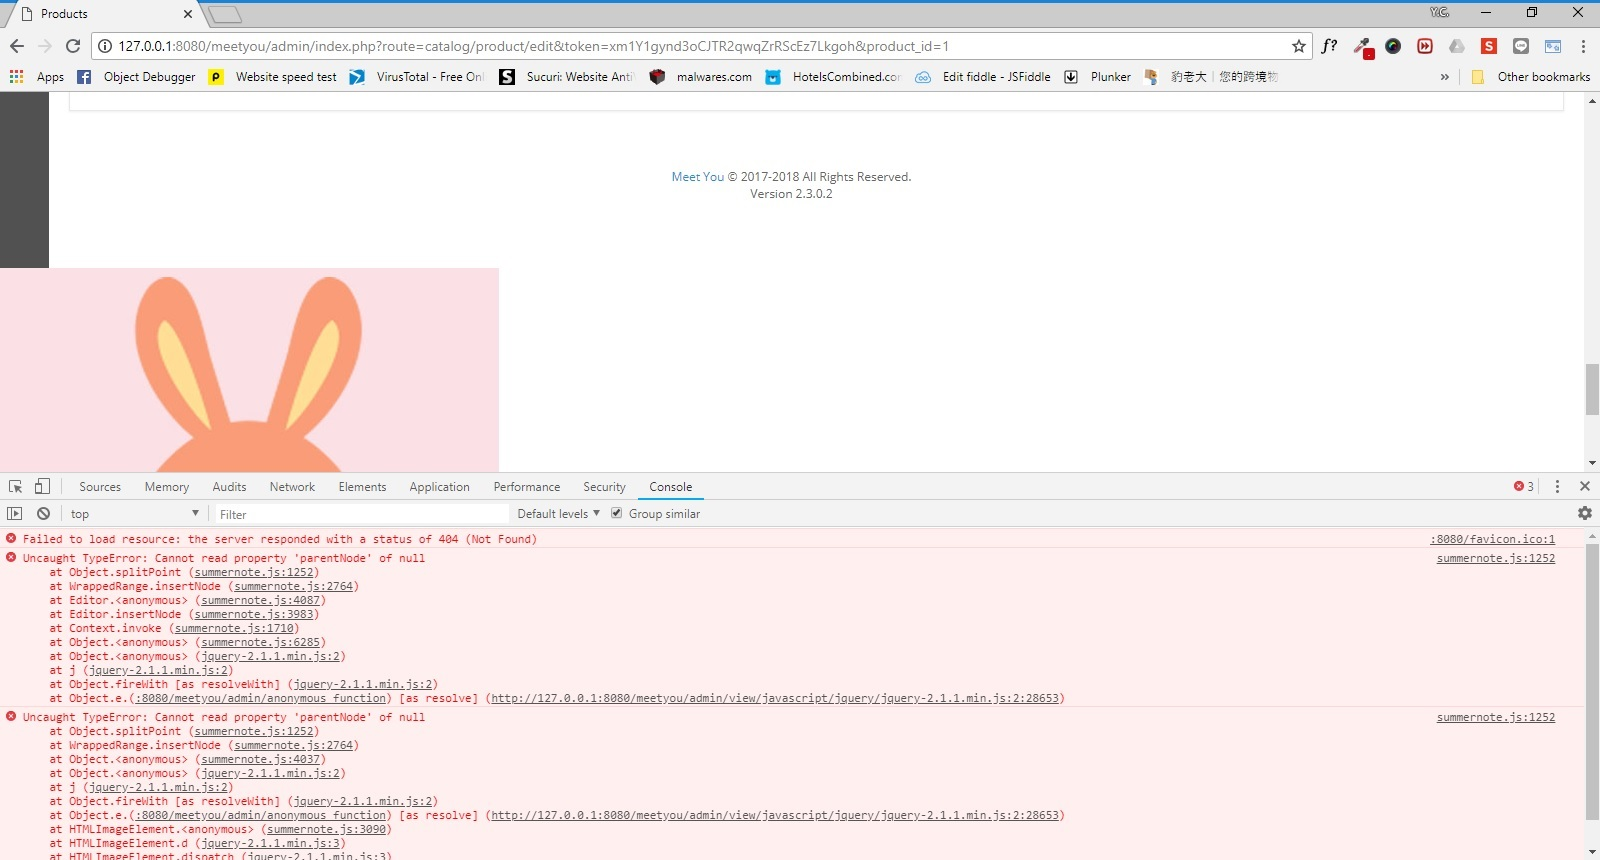 Multiple Summernote error: Uncaught TypeError: Cannot read